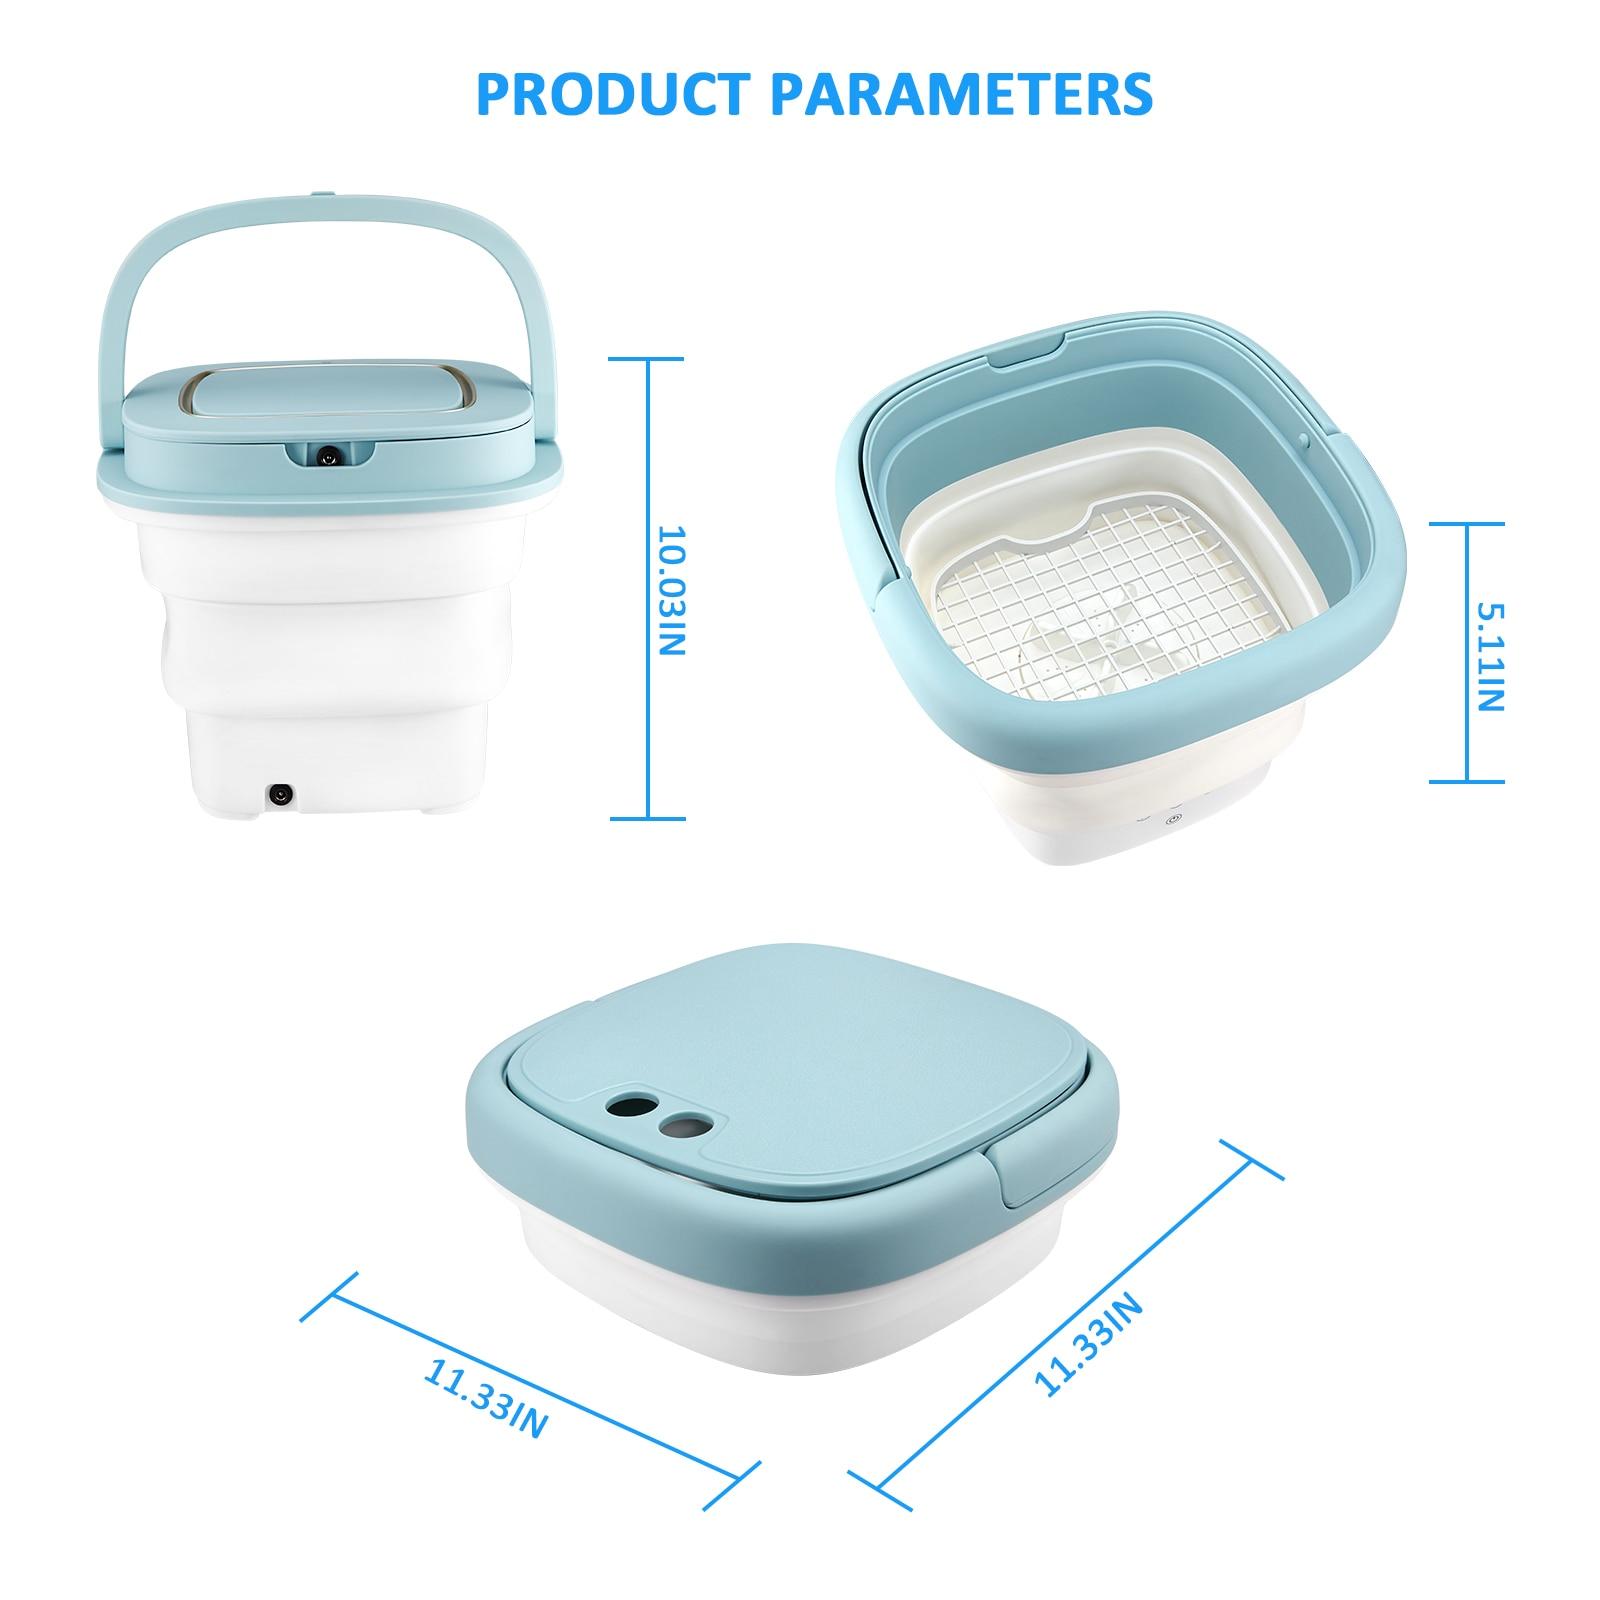 Portable Washing Machine Folding Washing Machine Ultrasonic Cleaning Sterilization Drying Washing Machine Small Mini Portable enlarge